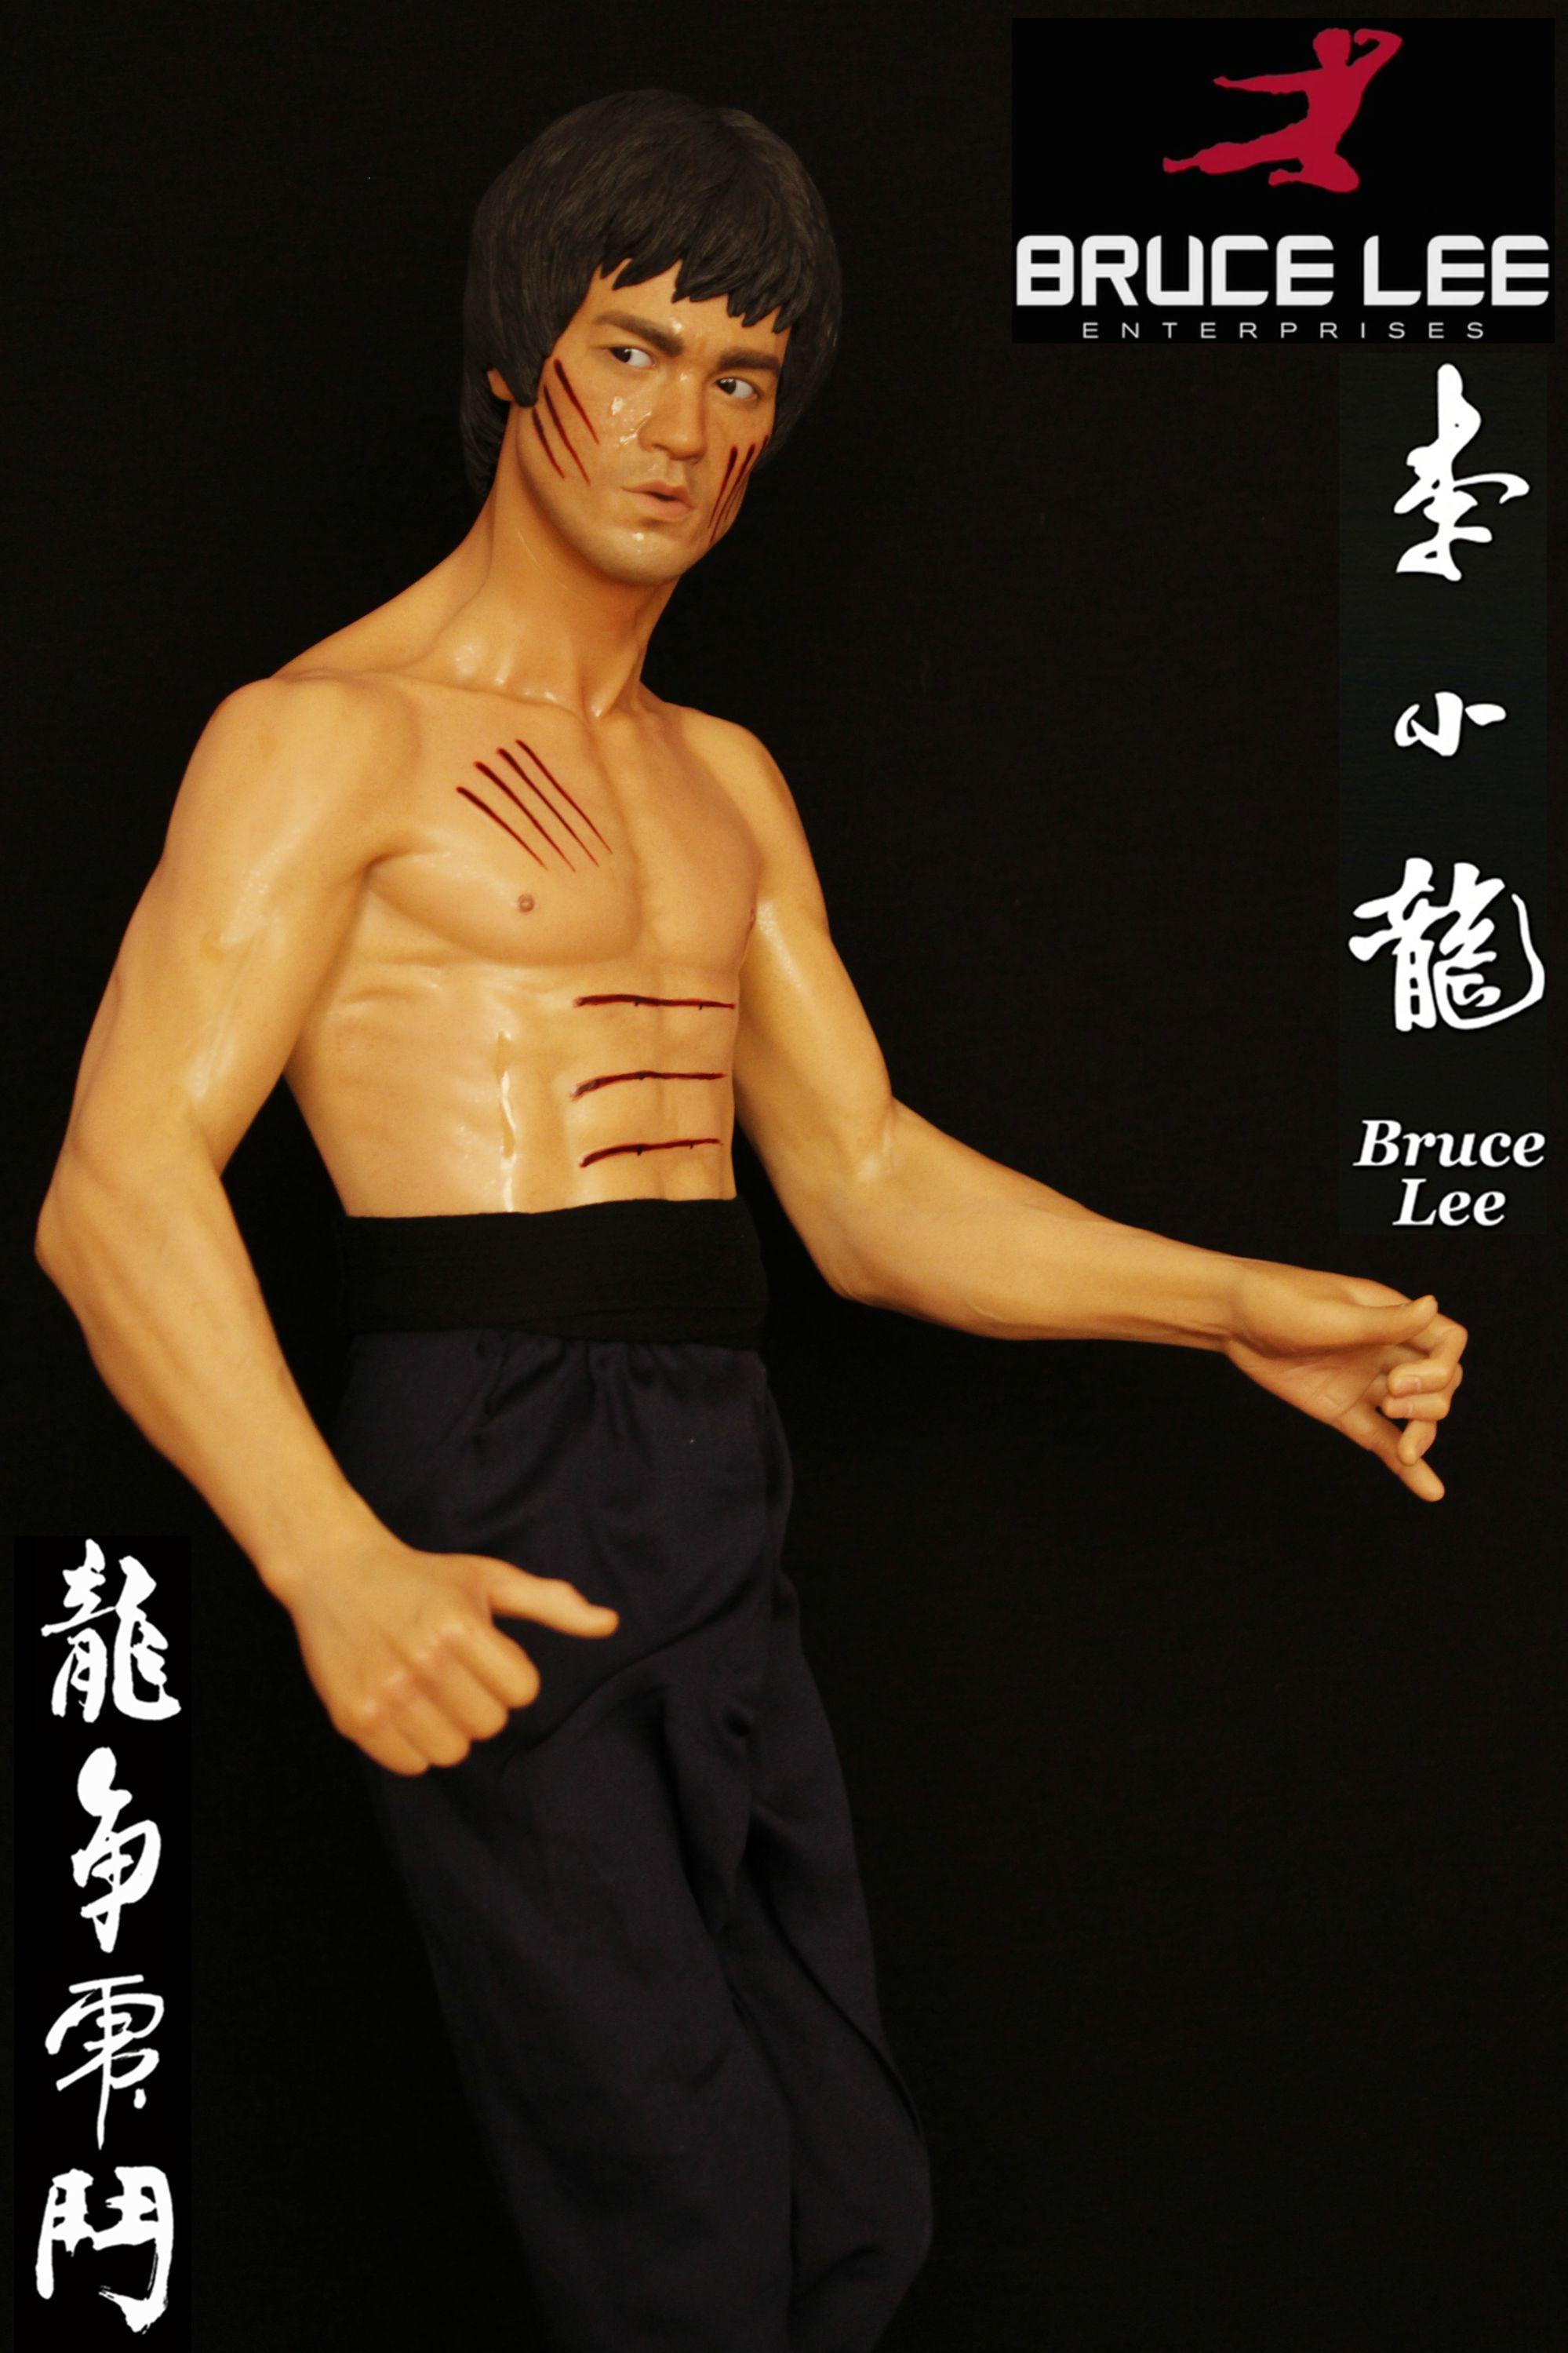 [Blitzway] Bruce Lee Tribute - 1/3 Scale - LANÇADO!!! - Página 6 211954zhomy5yqyzl8r47q